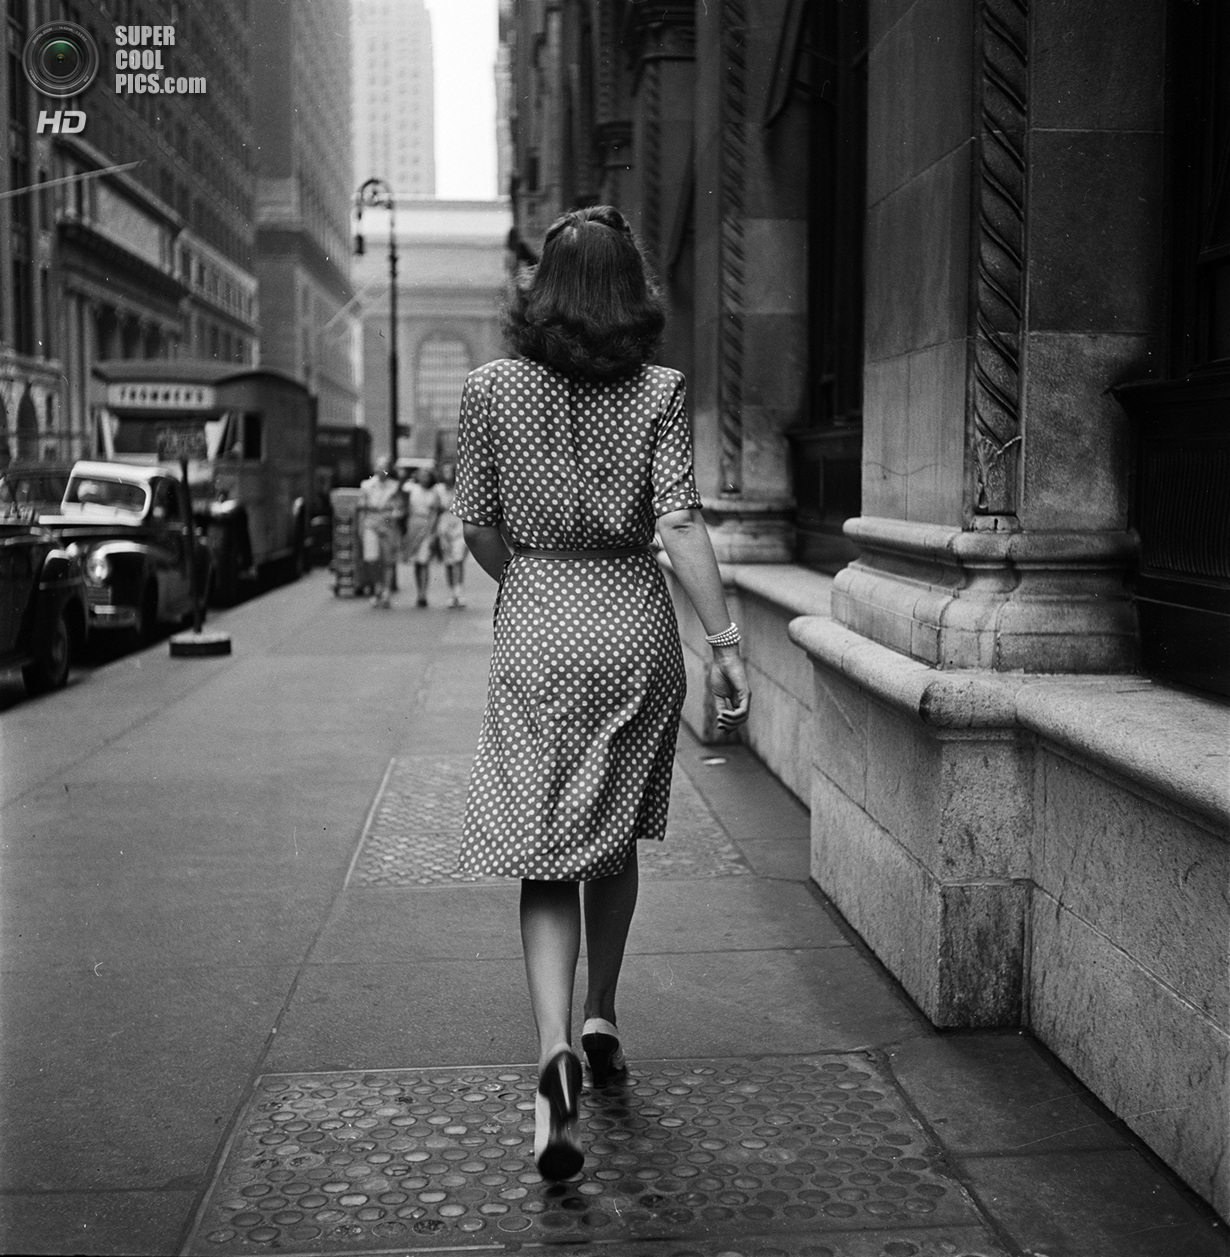 США. Нью-Йорк. 1946 год. Девушка на улице. (V&M/Look/Stanley Kubrick)